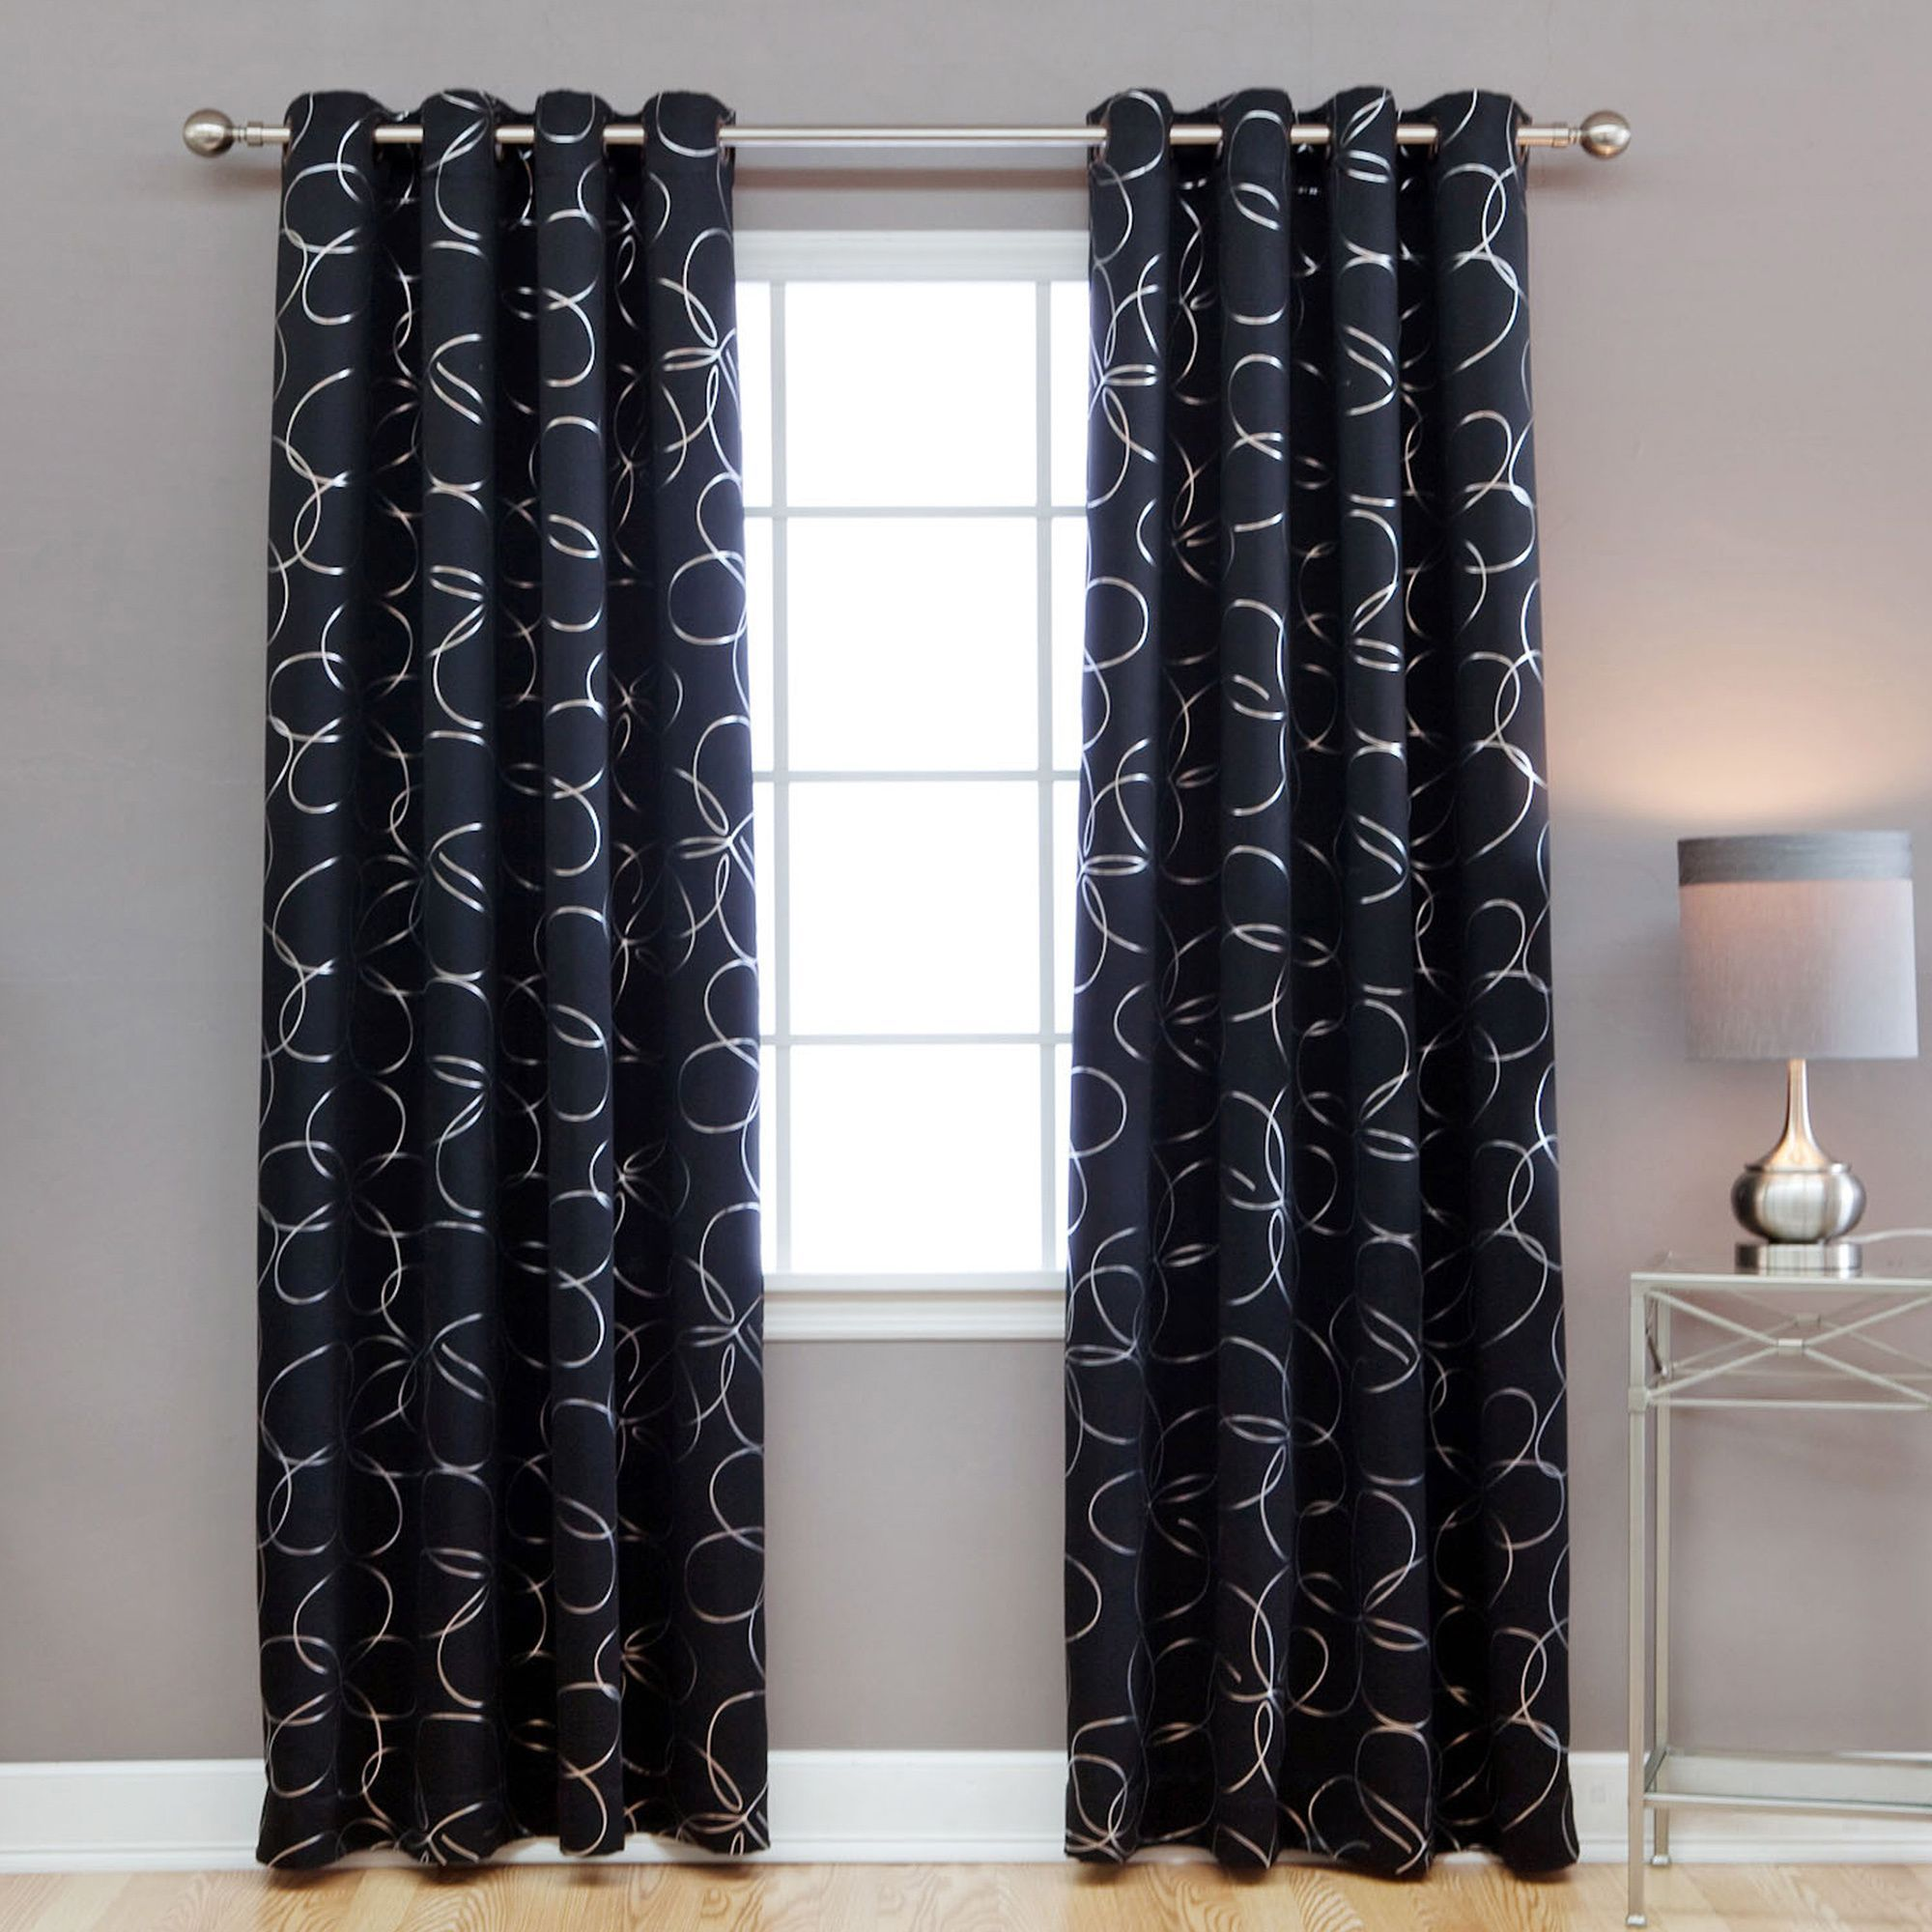 Aurora Home Modern Foil 96 Inch Blackout Grommet Curtain Panel Pair